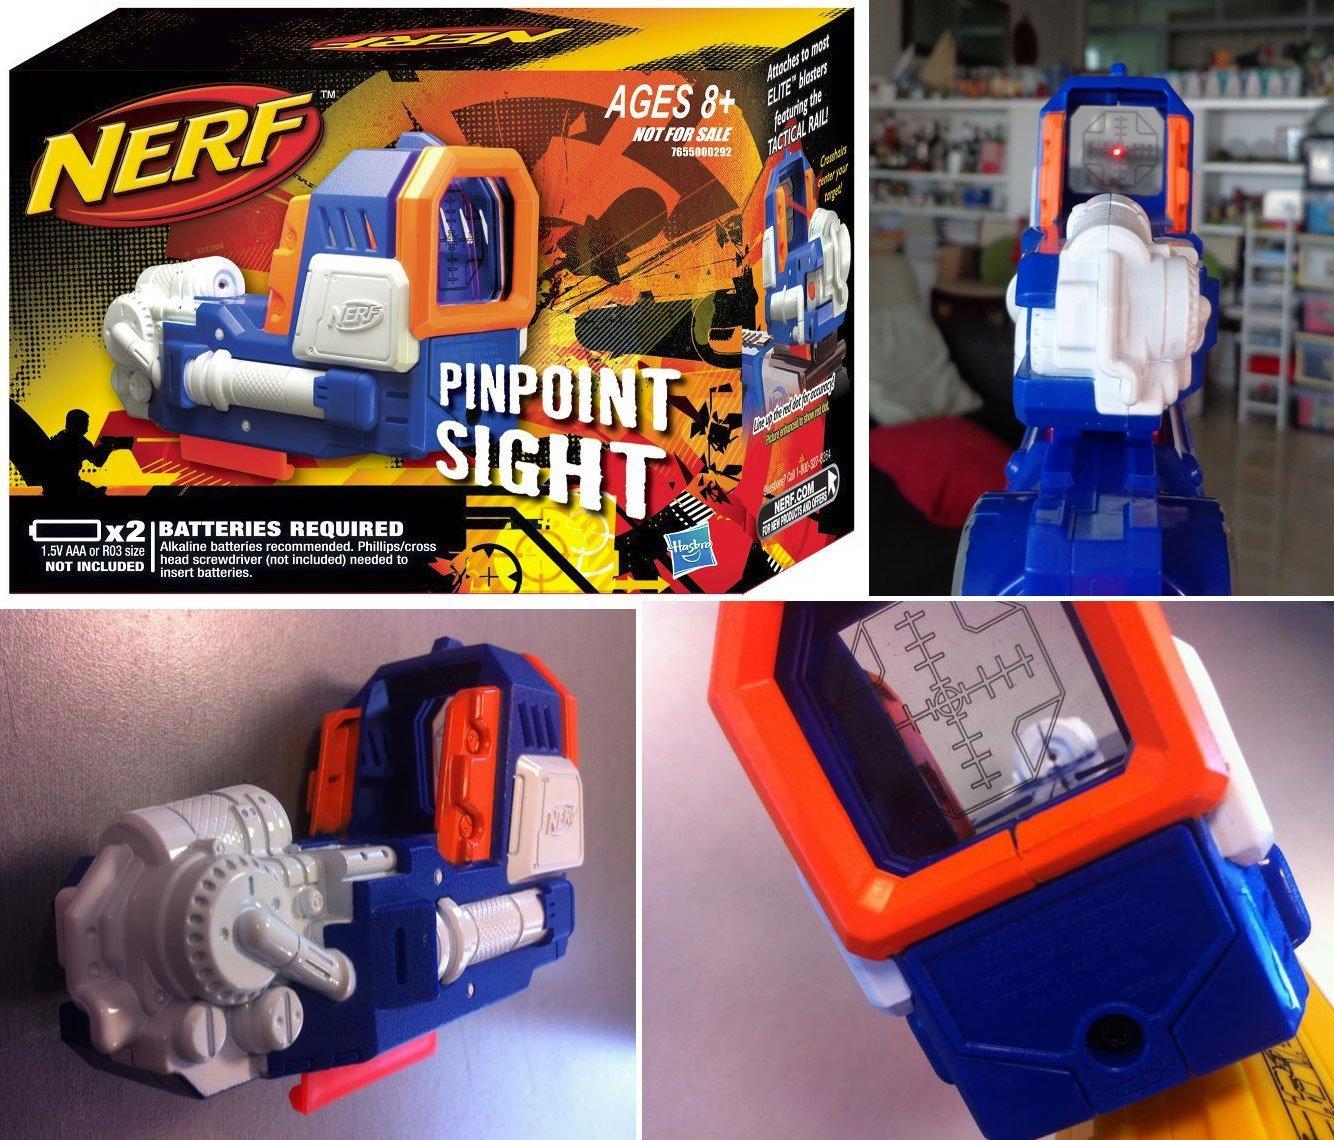 Nerf Pinpoint Sight Elite Rebelle Strike Mount Mission Kit Hasbro